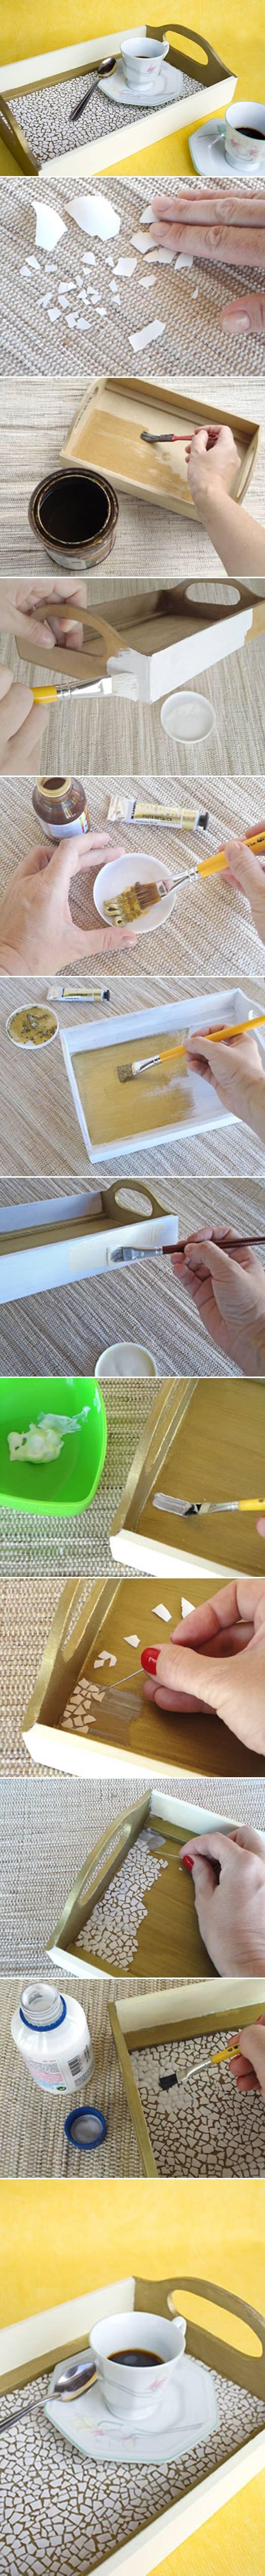 DIY-Eggshell-Mosaic-Tray